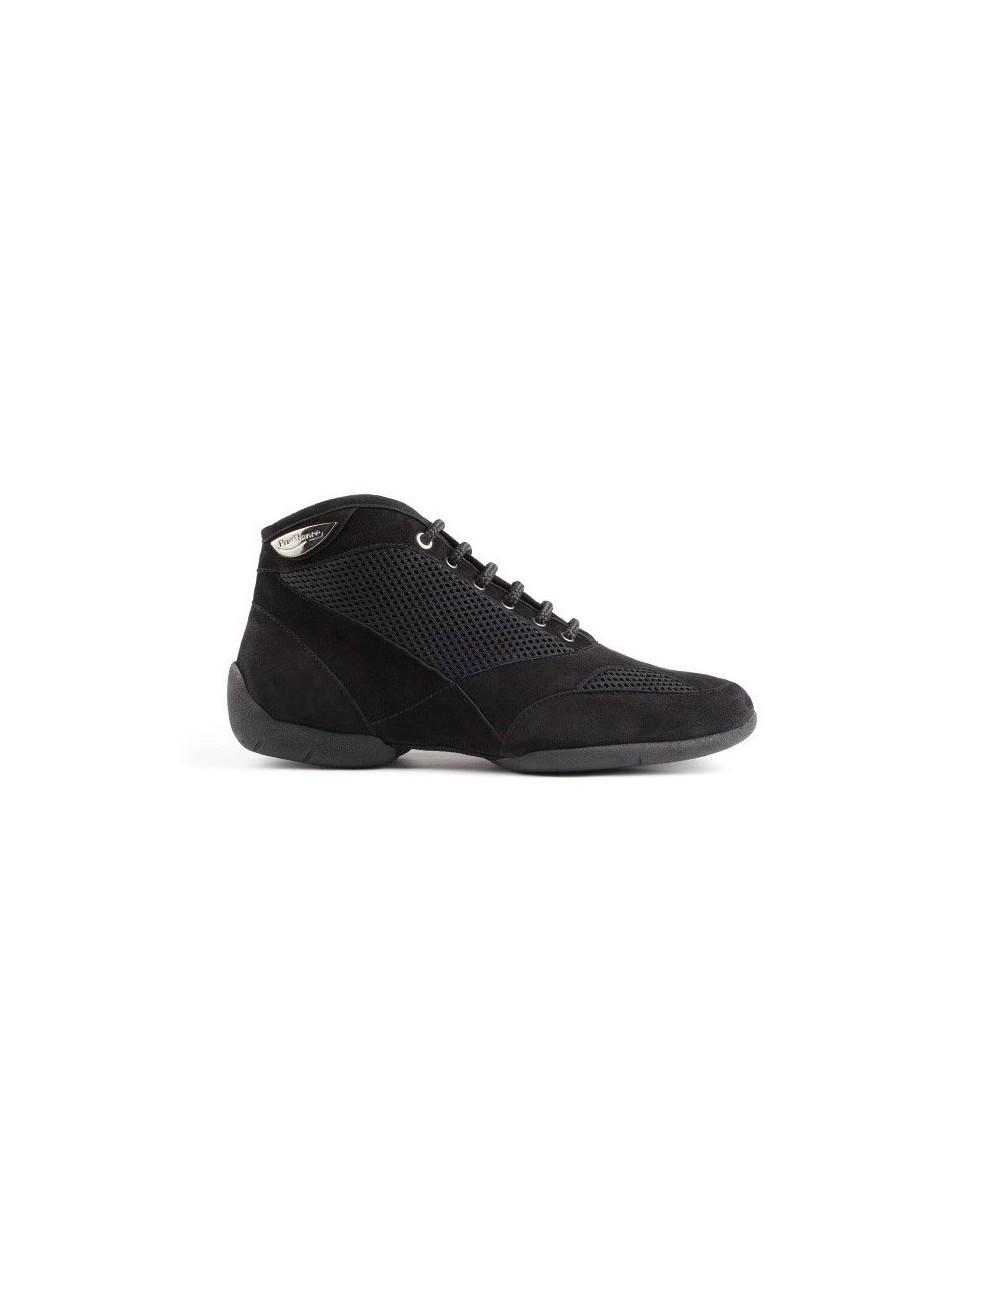 gran descuento nueva colección zapatos para baratas ZAPATILLAS HOMBRE PARA BAILES LATINOS FORMA BOTIN